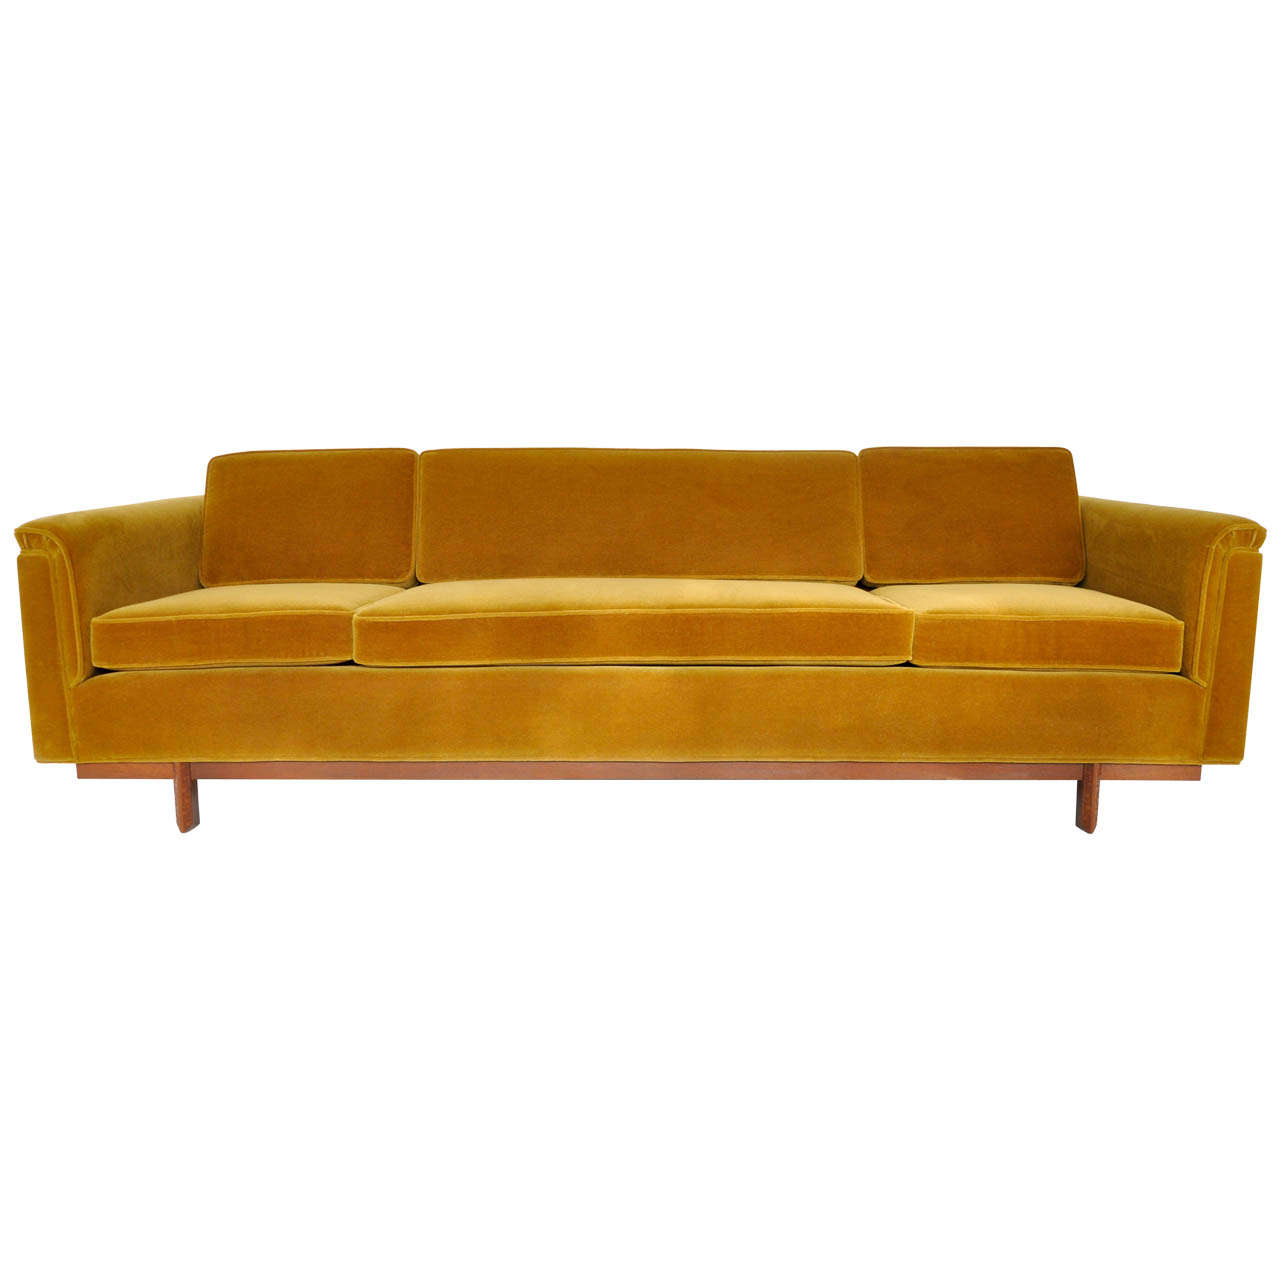 Frank Lloyd Wright Sofa At 1stdibs